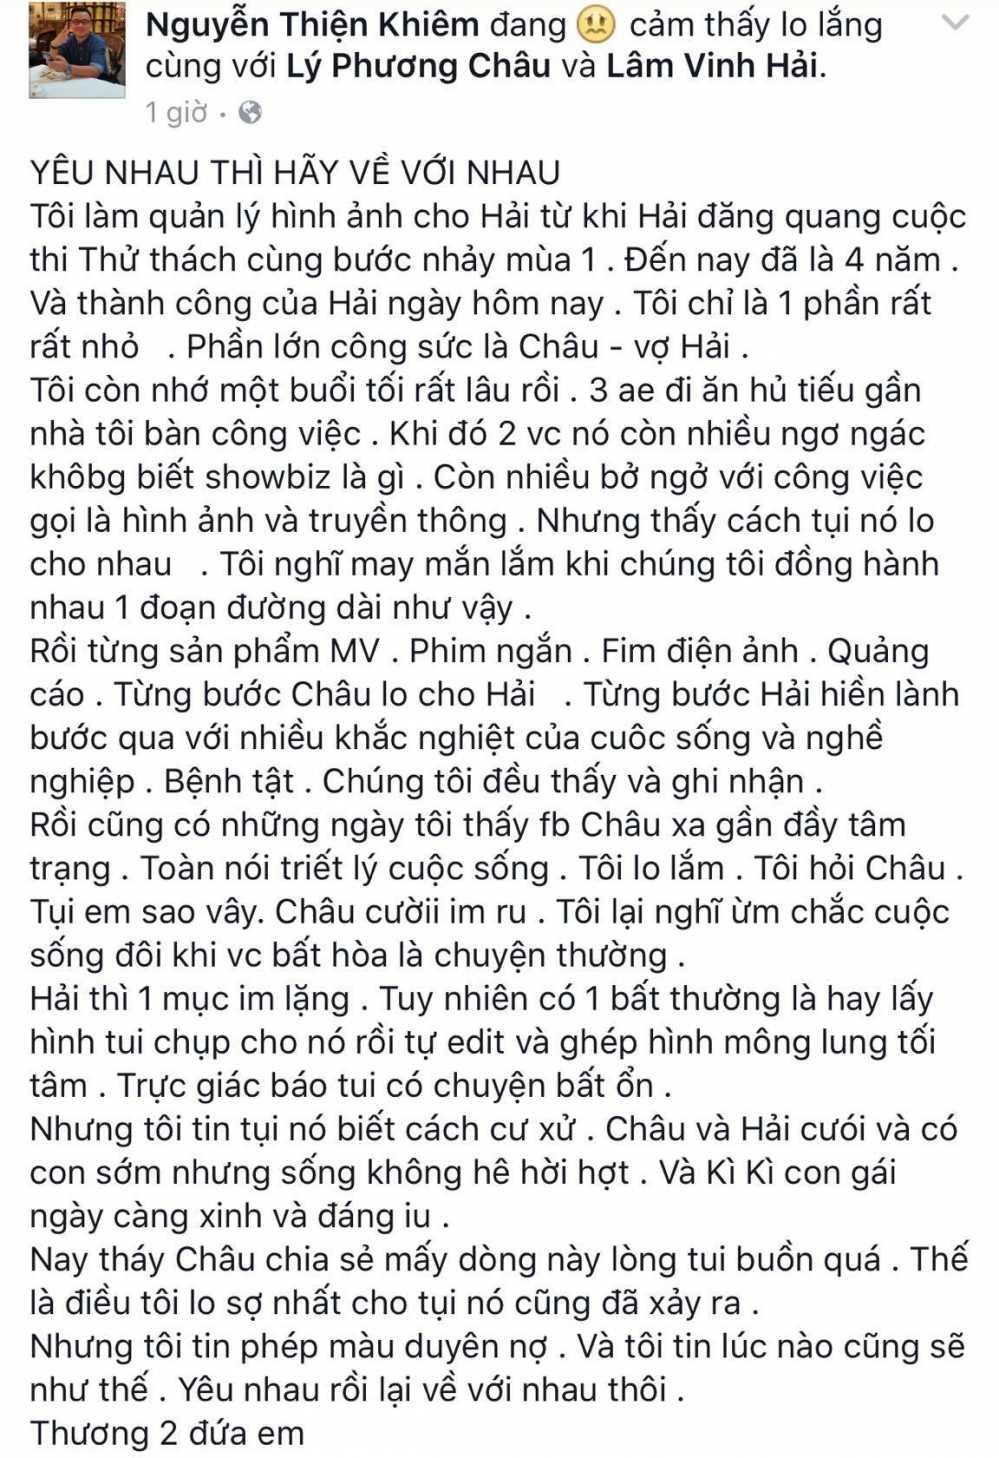 Xuc dong voi loi chia tay van minh cua vo Lam Vinh Hai hinh anh 4